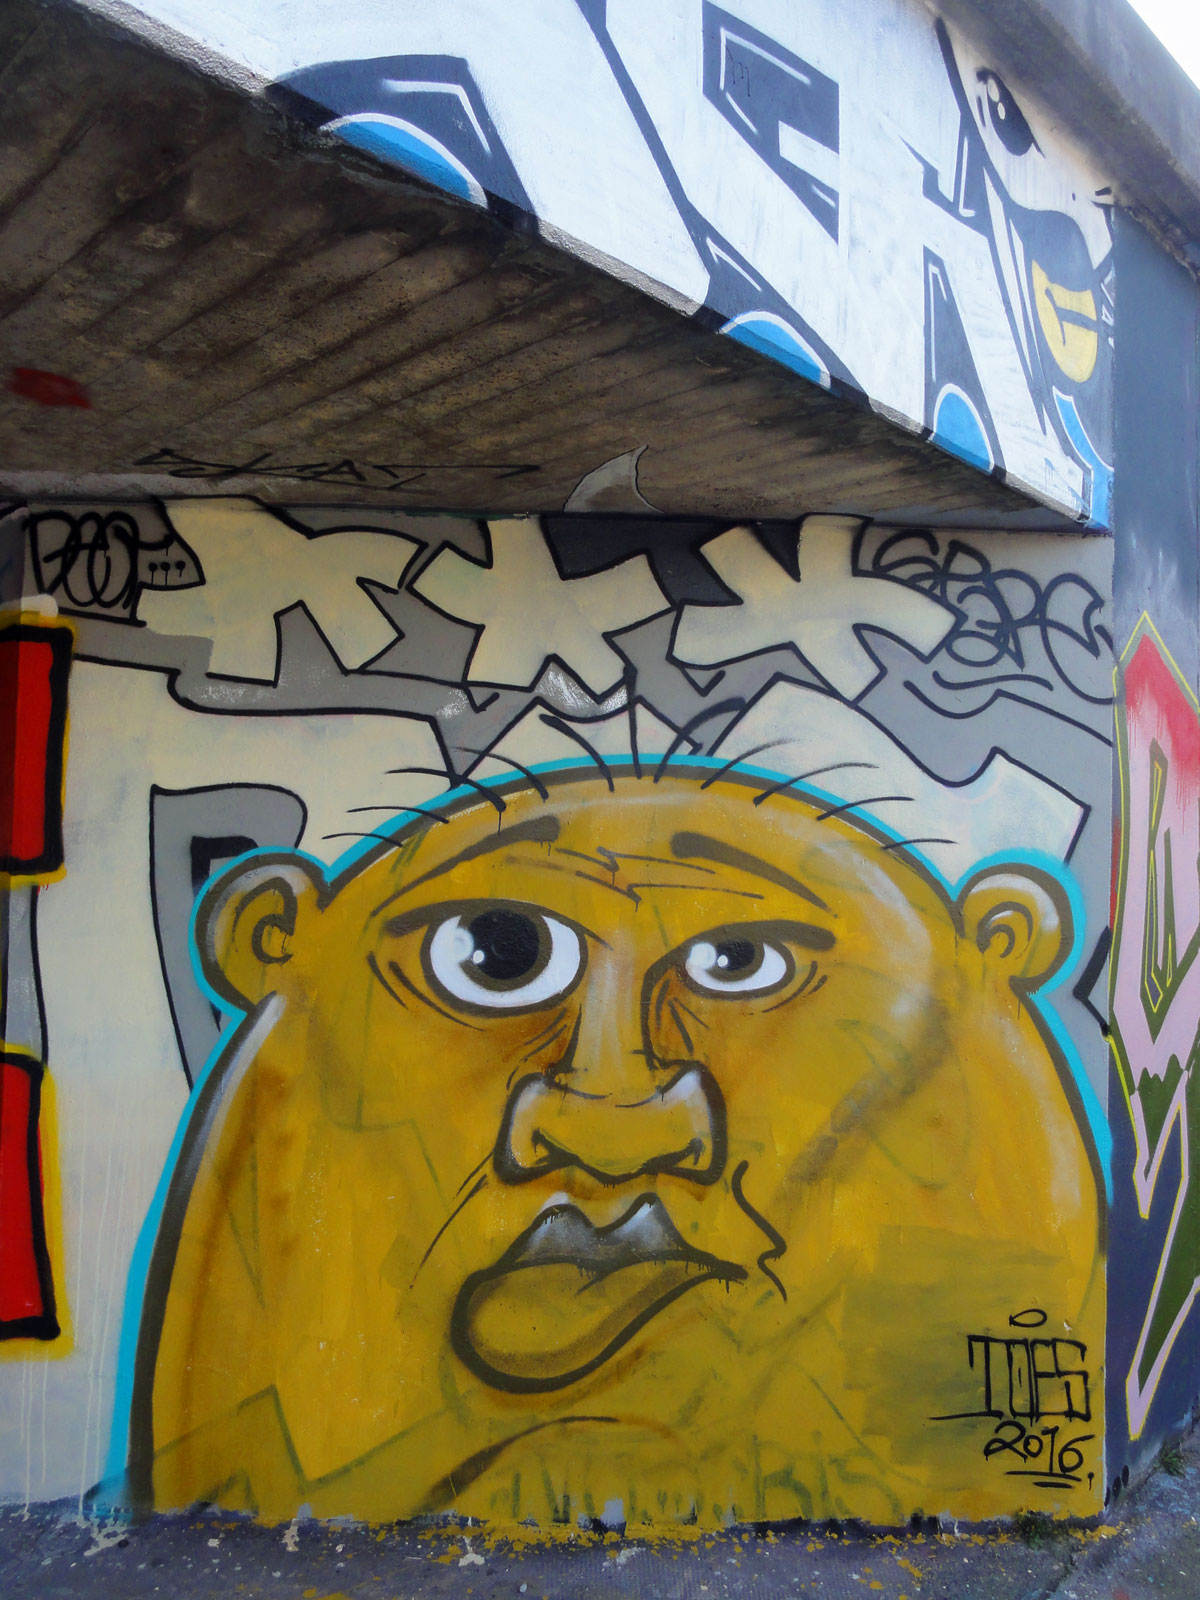 toes-character-graffiti-hanauer-landstrasse